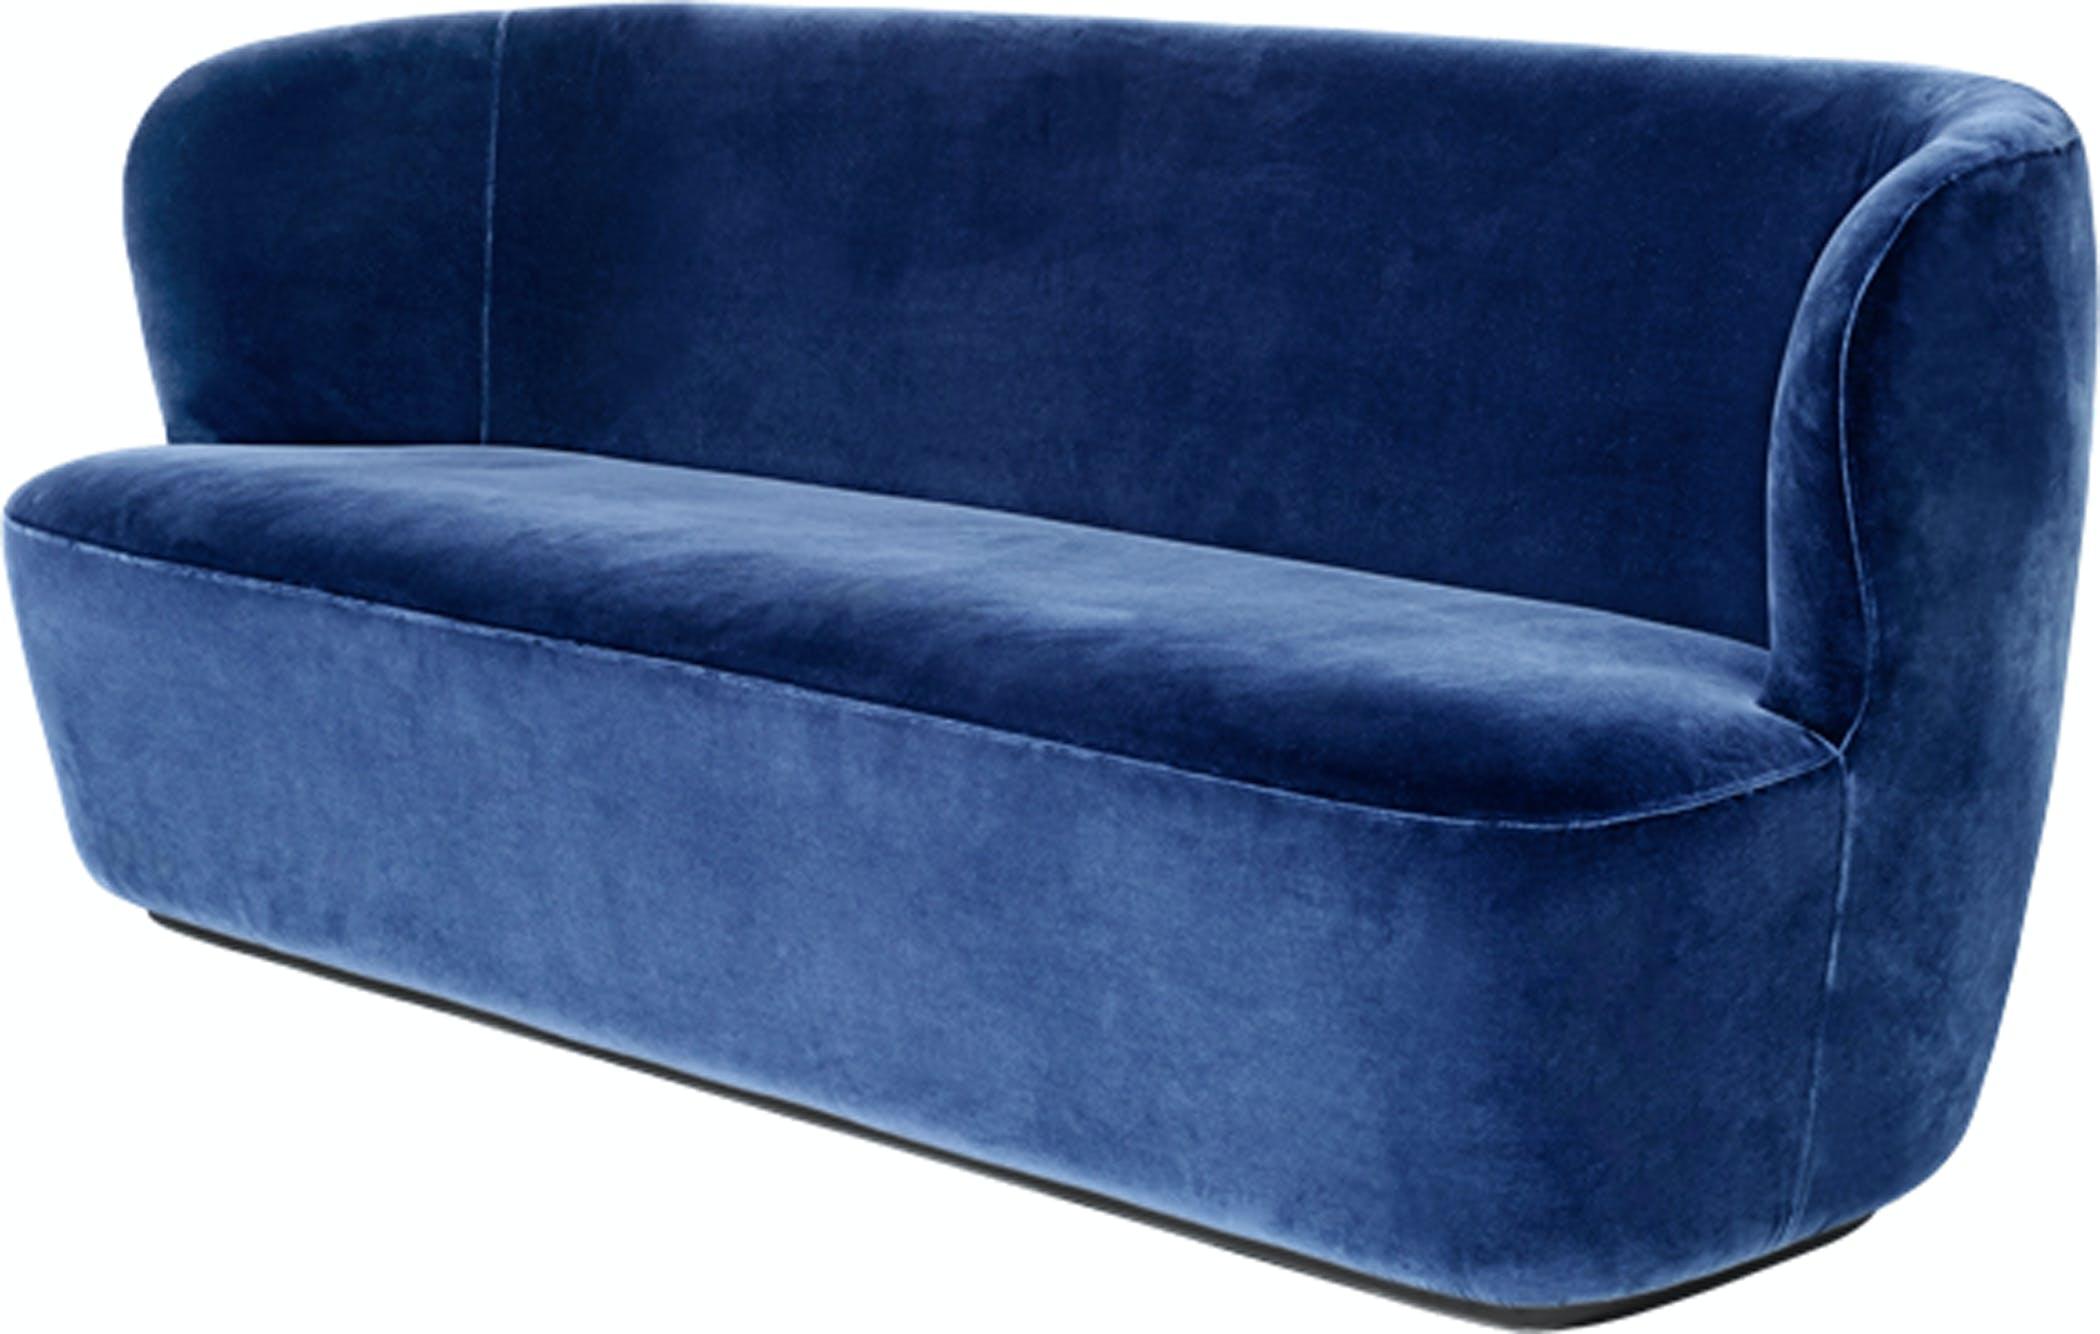 Stay Sofa 190 Vellutodicotone 420 Angle Image